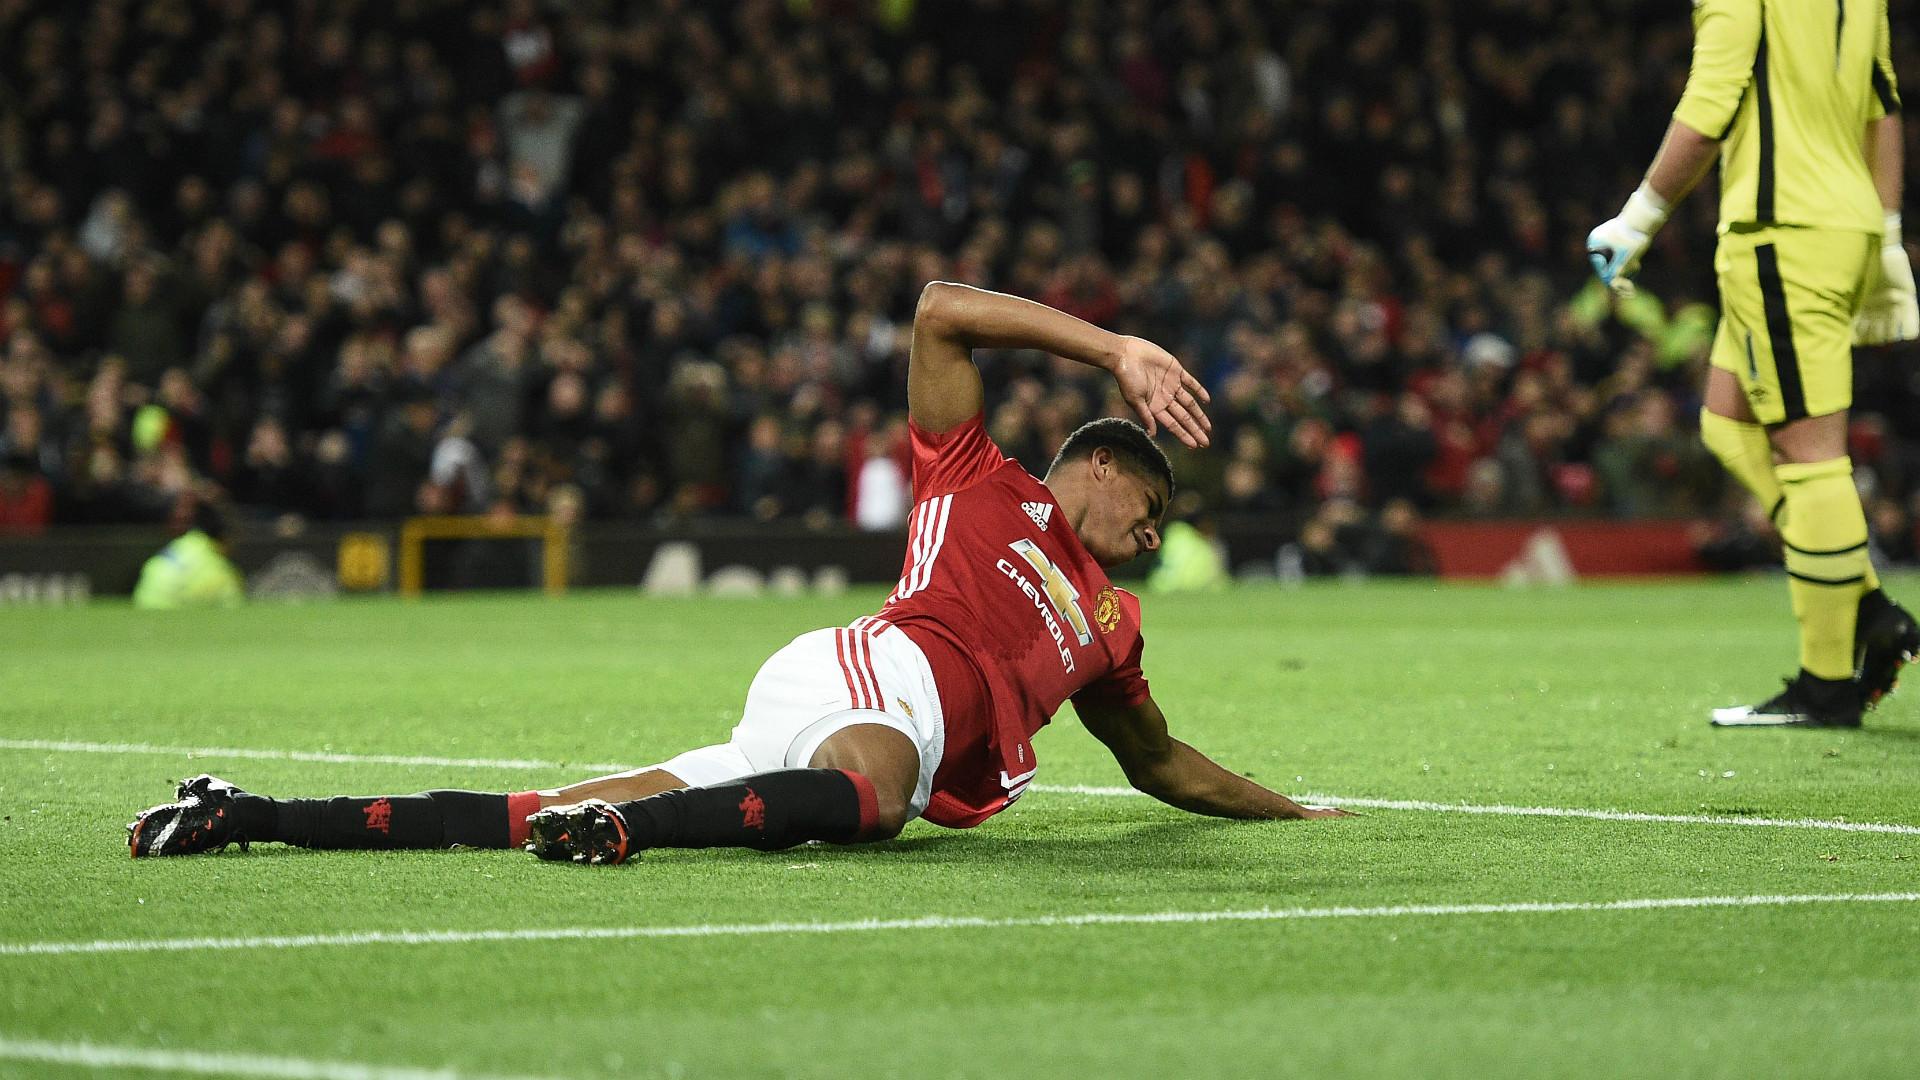 Marcus Rashford Manchester United 2017